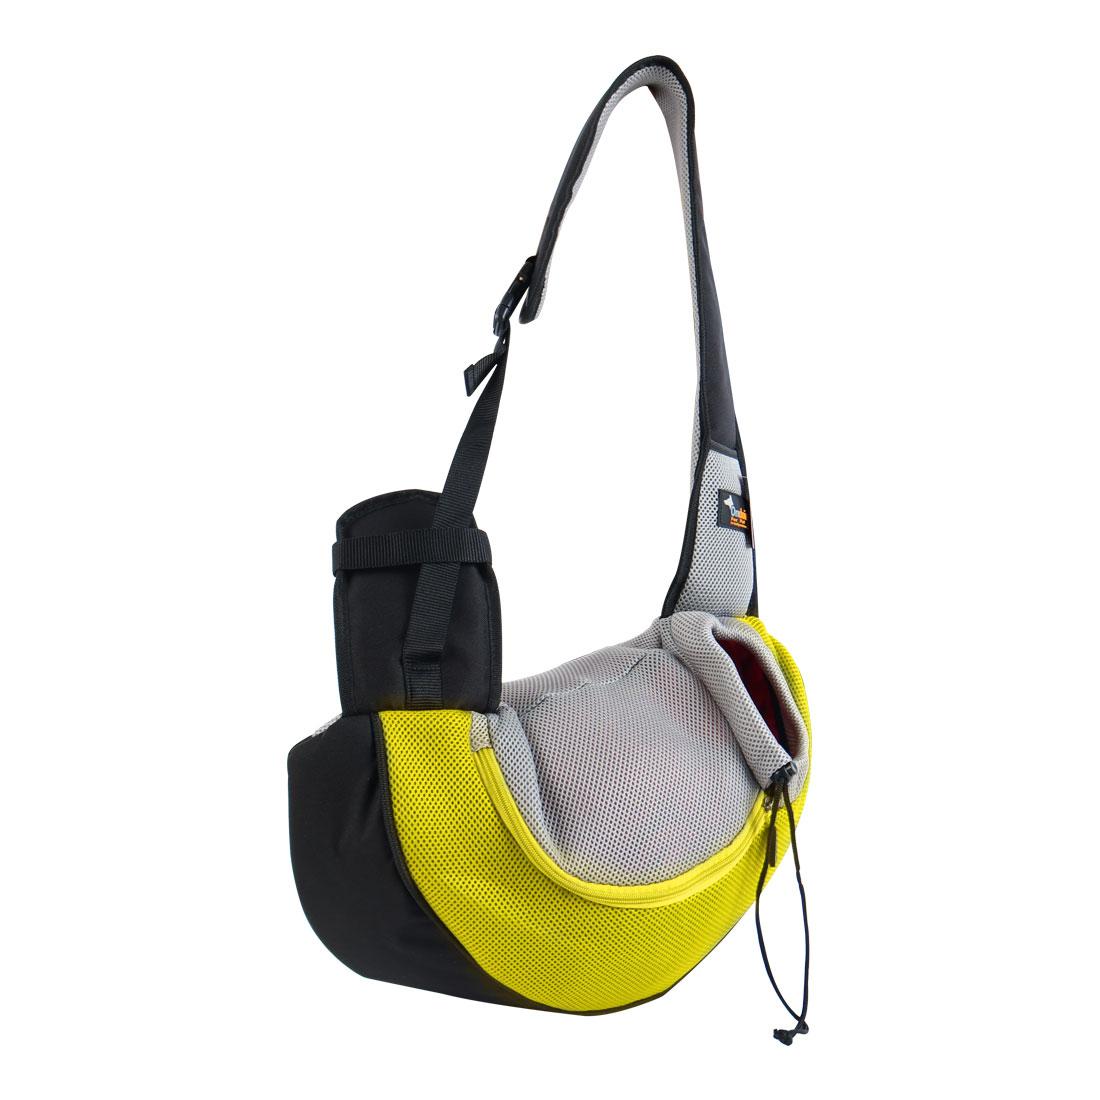 Onding Authorized Pet Dog Carrier Single Shoulder Backpack Blue Camo